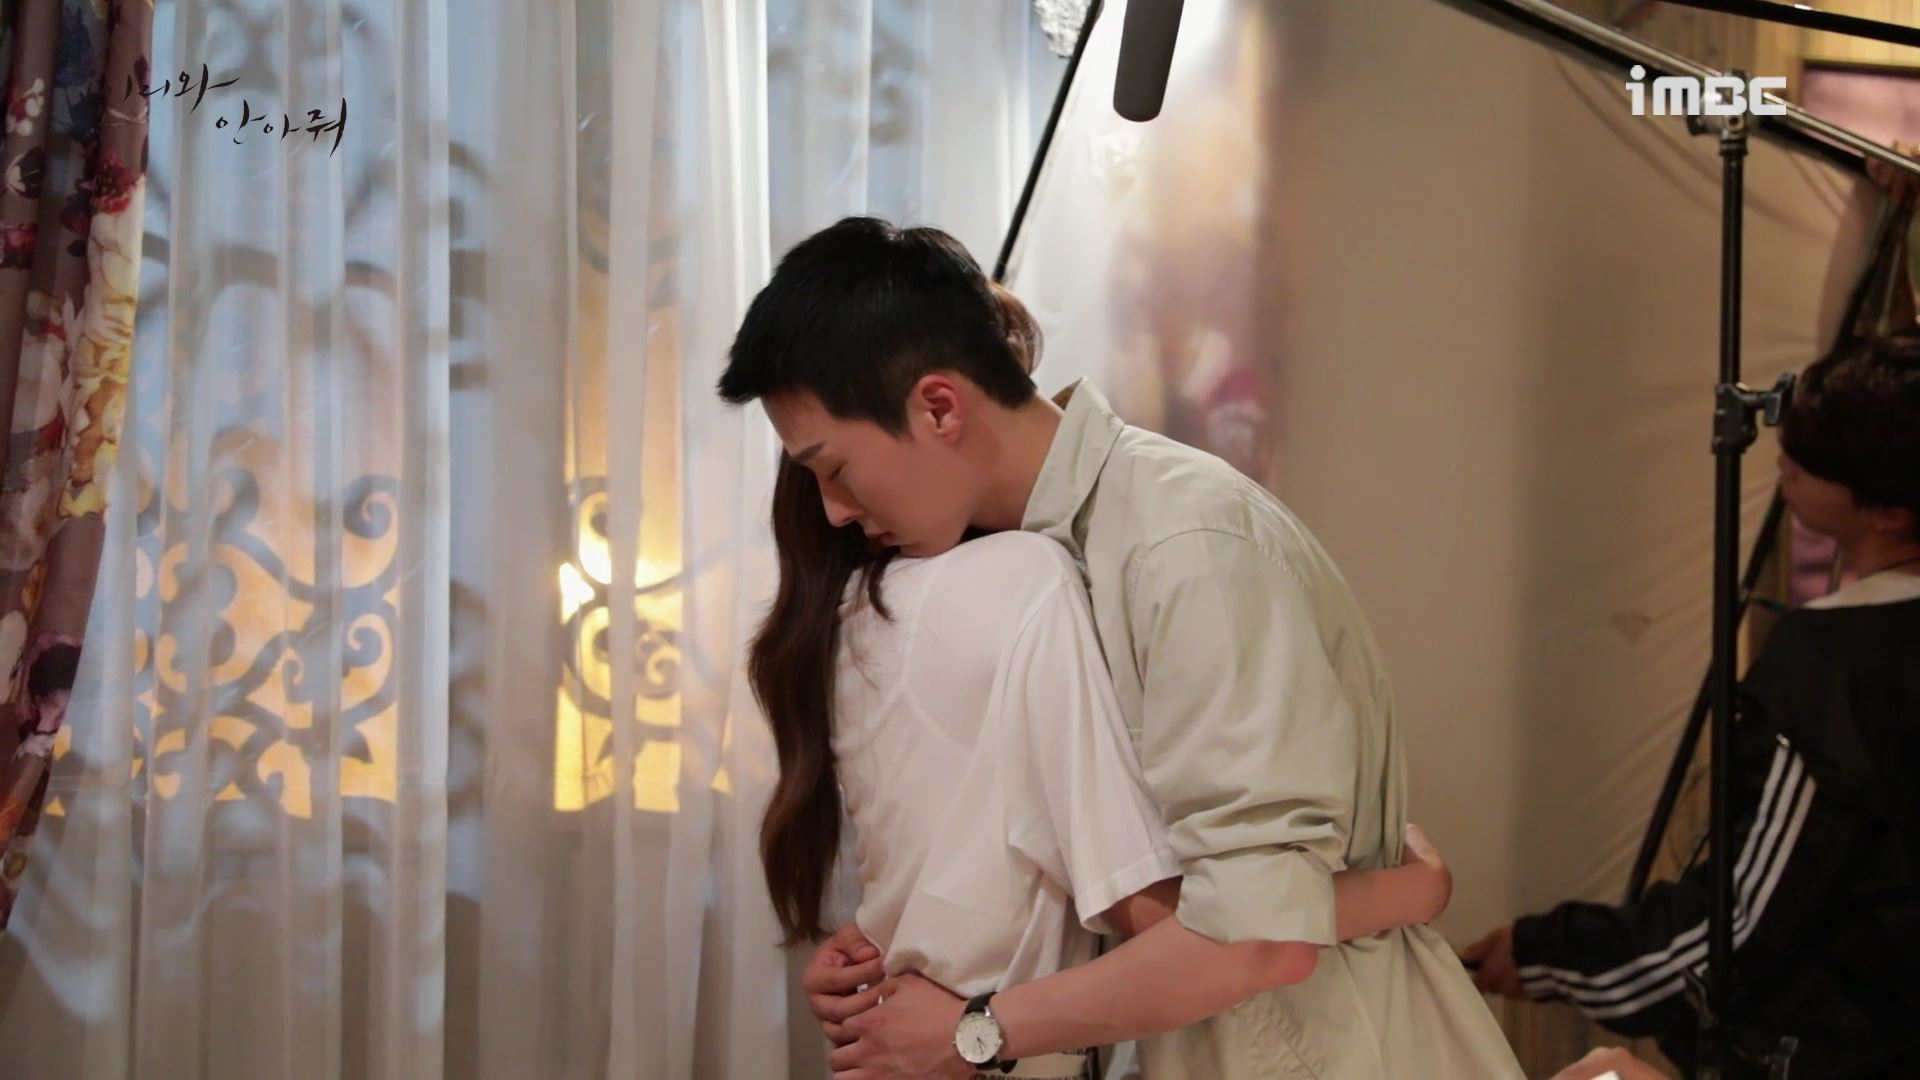 [M플레이] '이리와 안아줘' 장기용-진기주, 시청자 안아주는 장꾸 케미